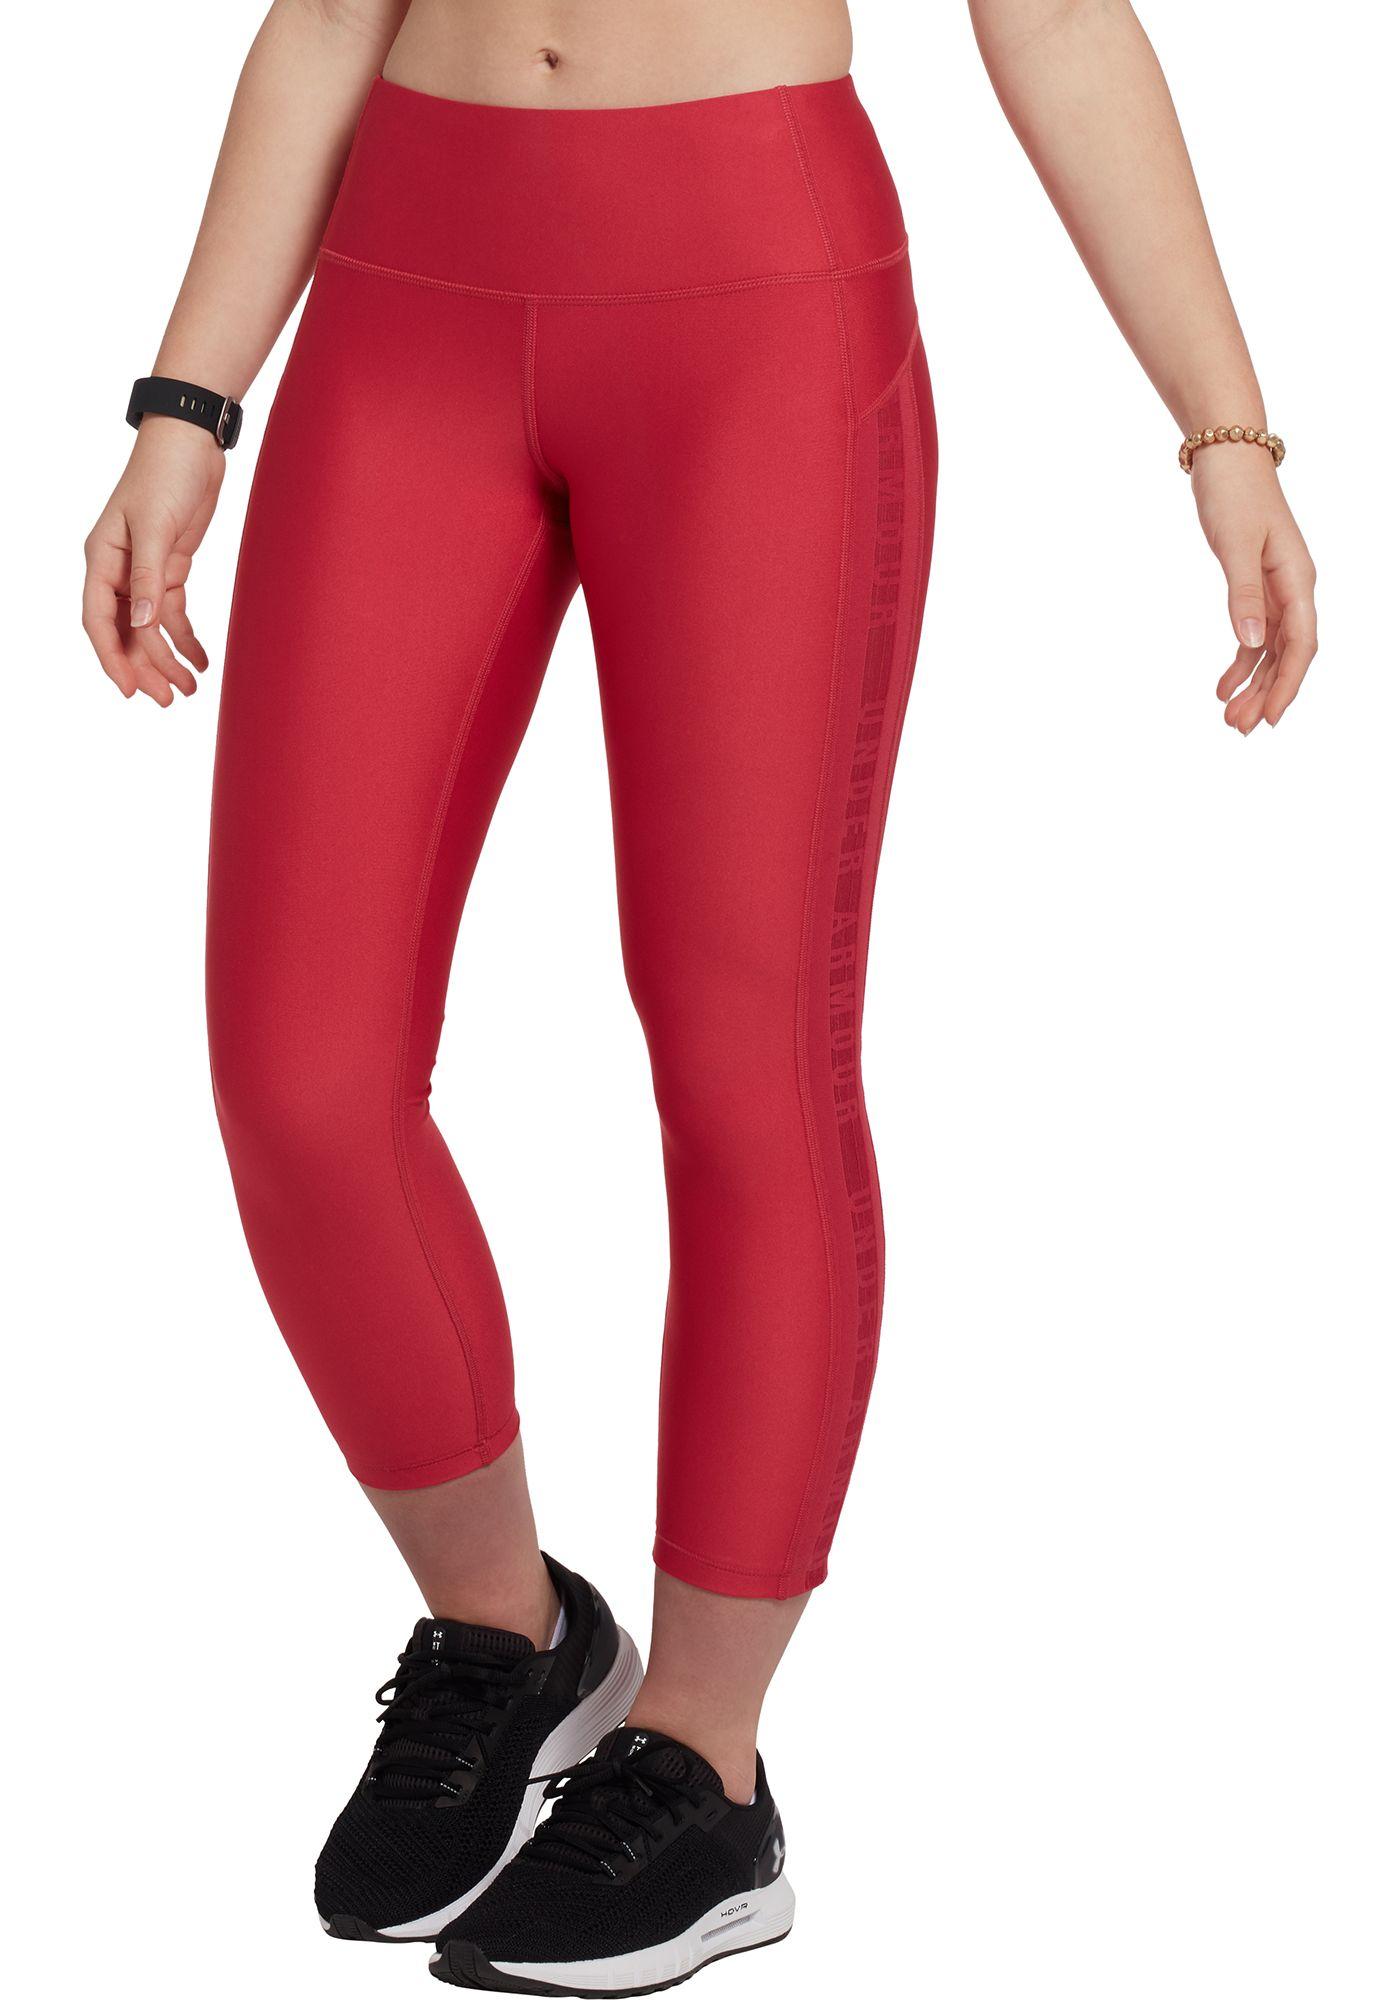 Under Armour Women's HeatGear Armour Ankle Crop Brand Leggings